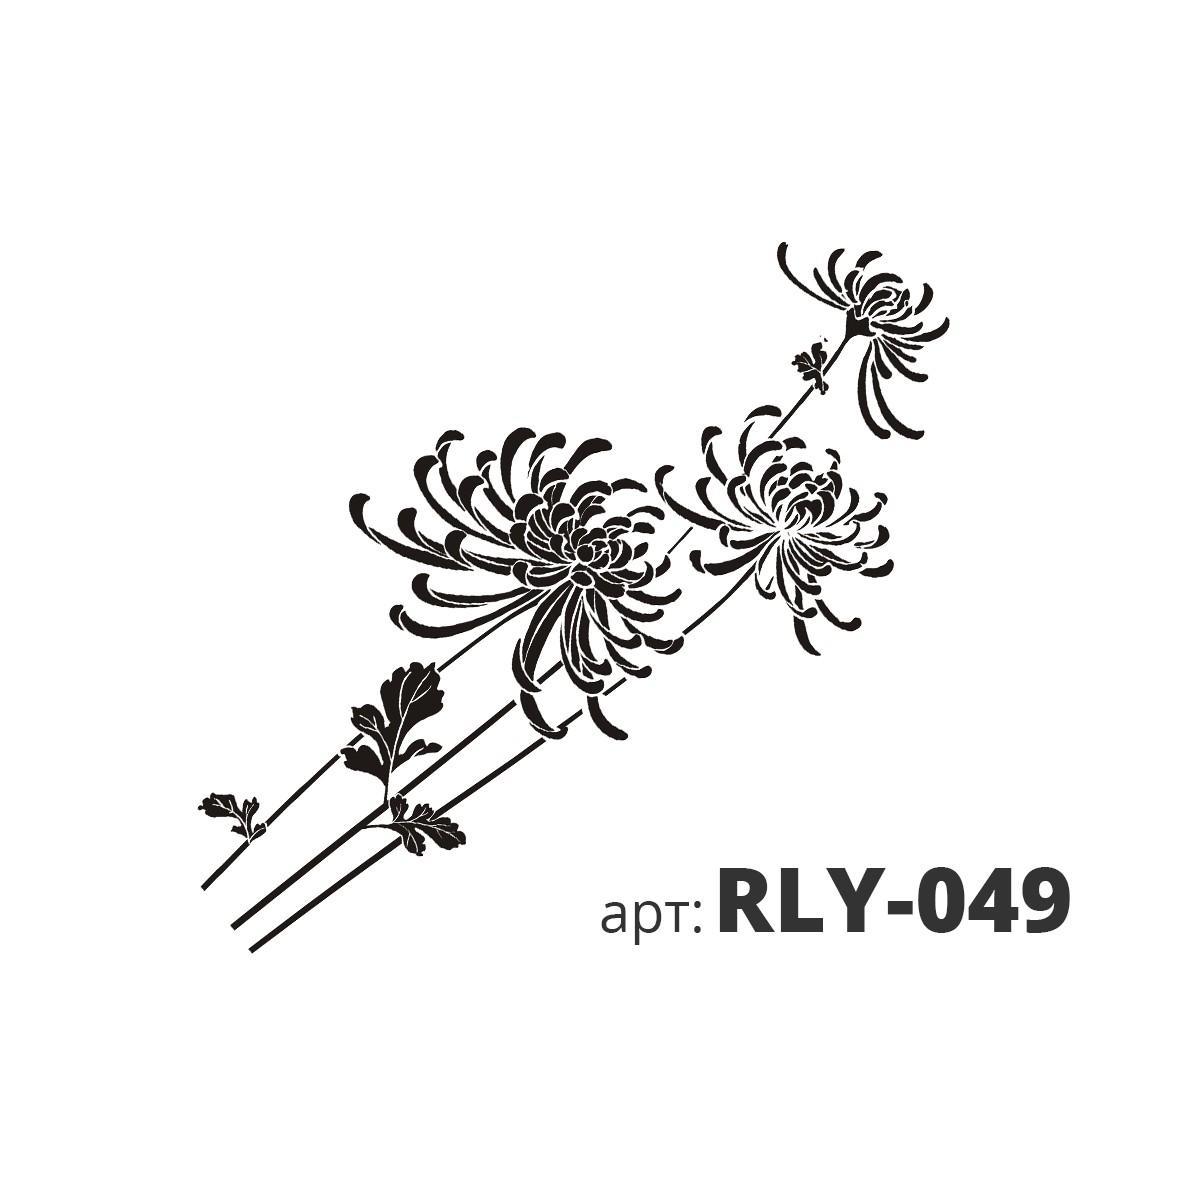 Трафарет виниловый ХРИЗАНТЕМА RLY-049